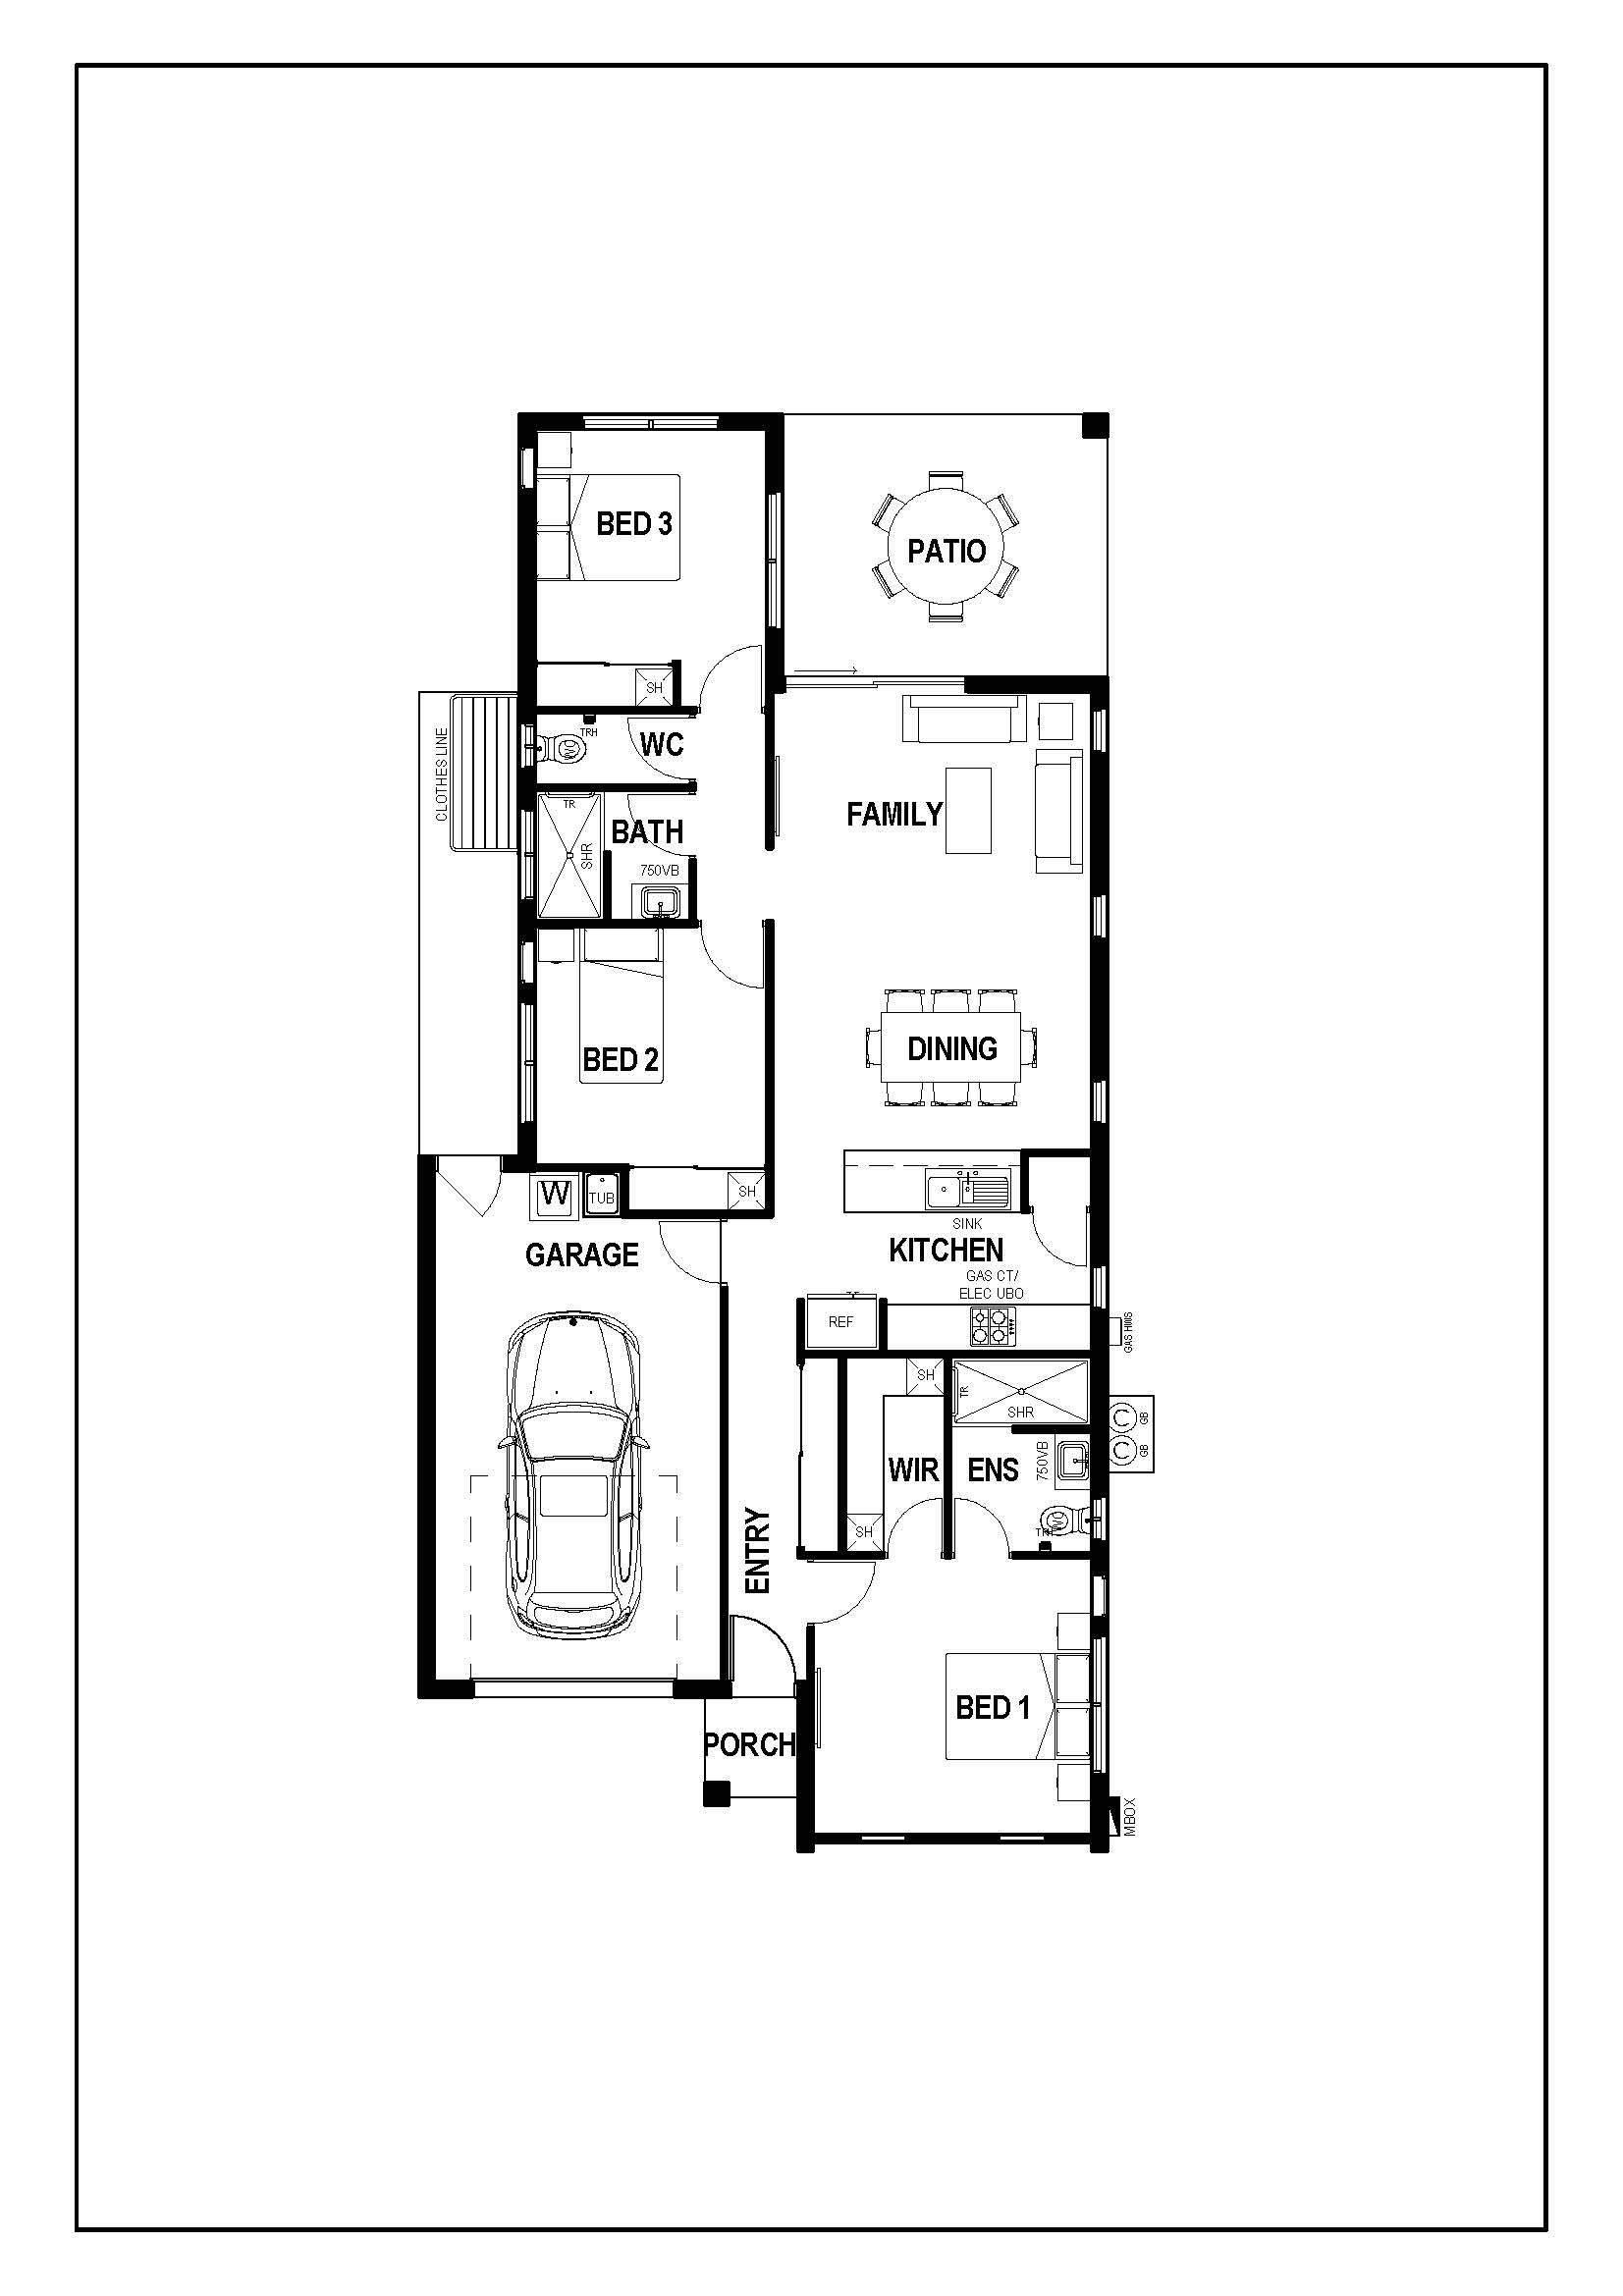 Carramar A 146 Single Garage Floor Plan.jpg